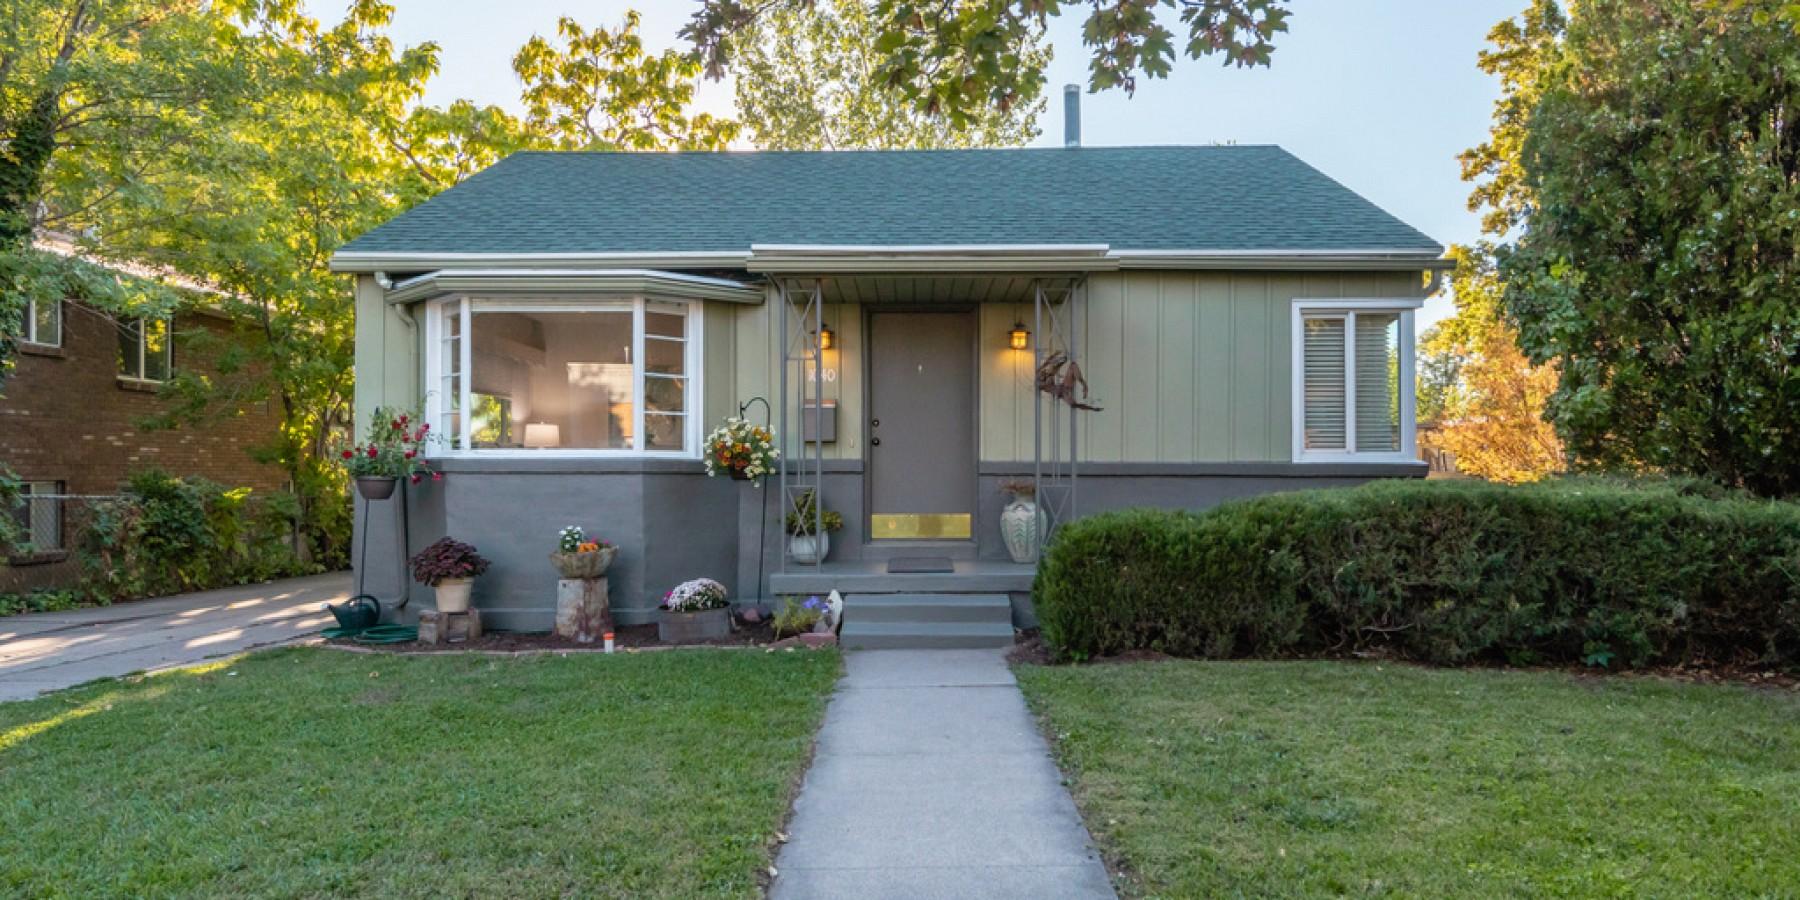 1040 South 900 East, Salt Lake City, UT 84105